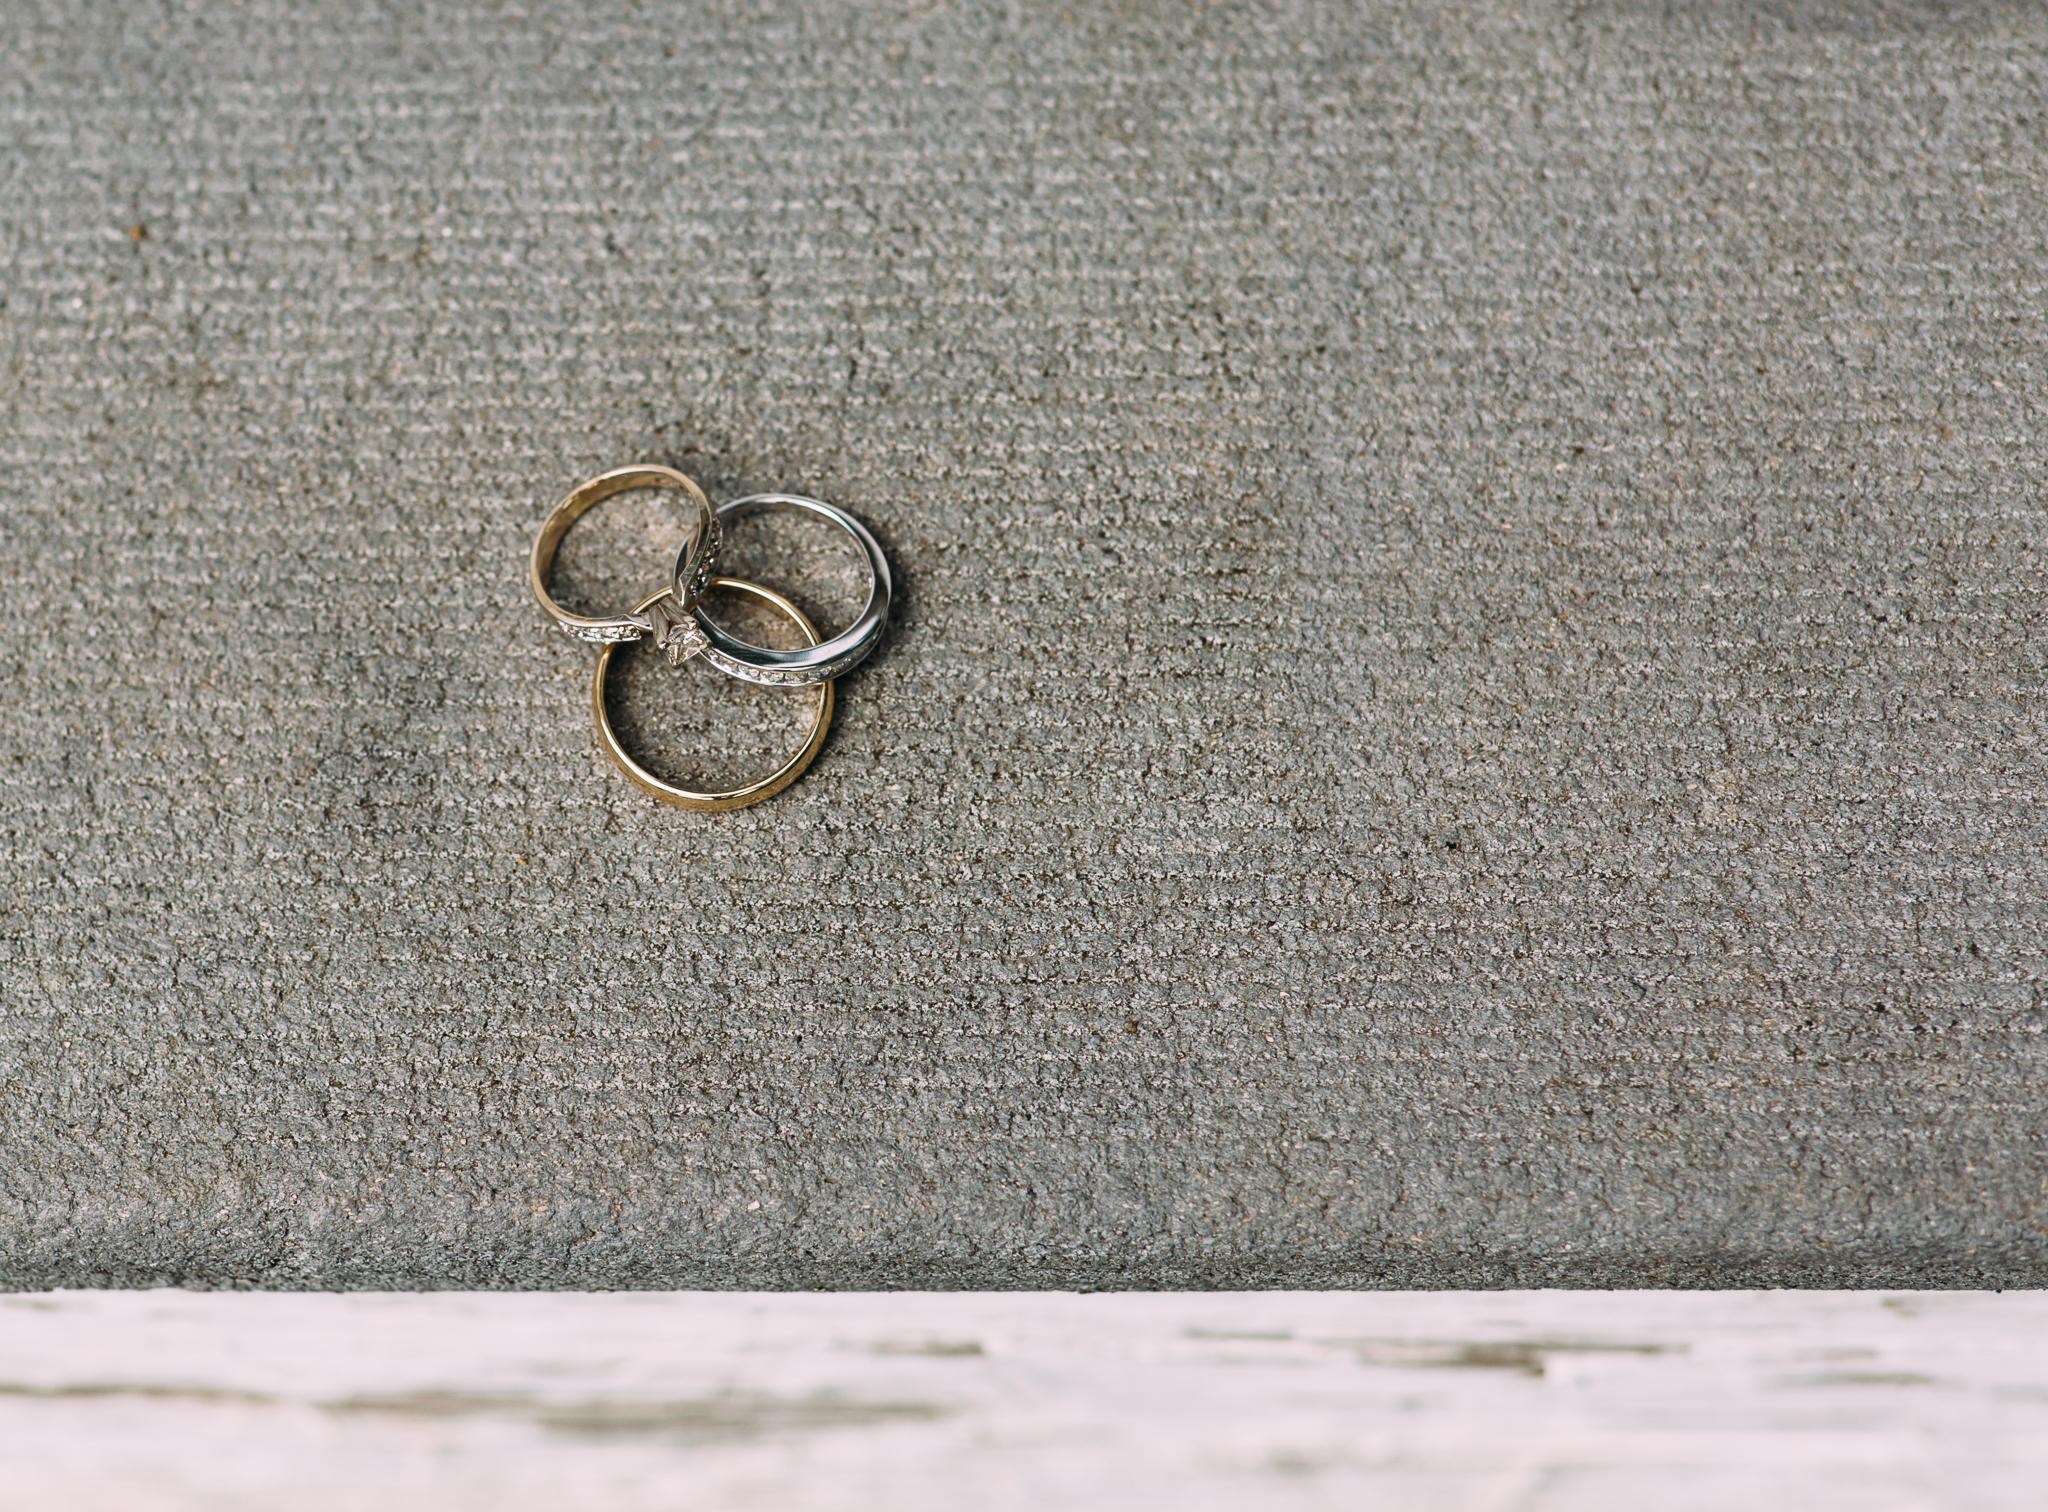 maine-wedding-rings-detail-shot.jpg